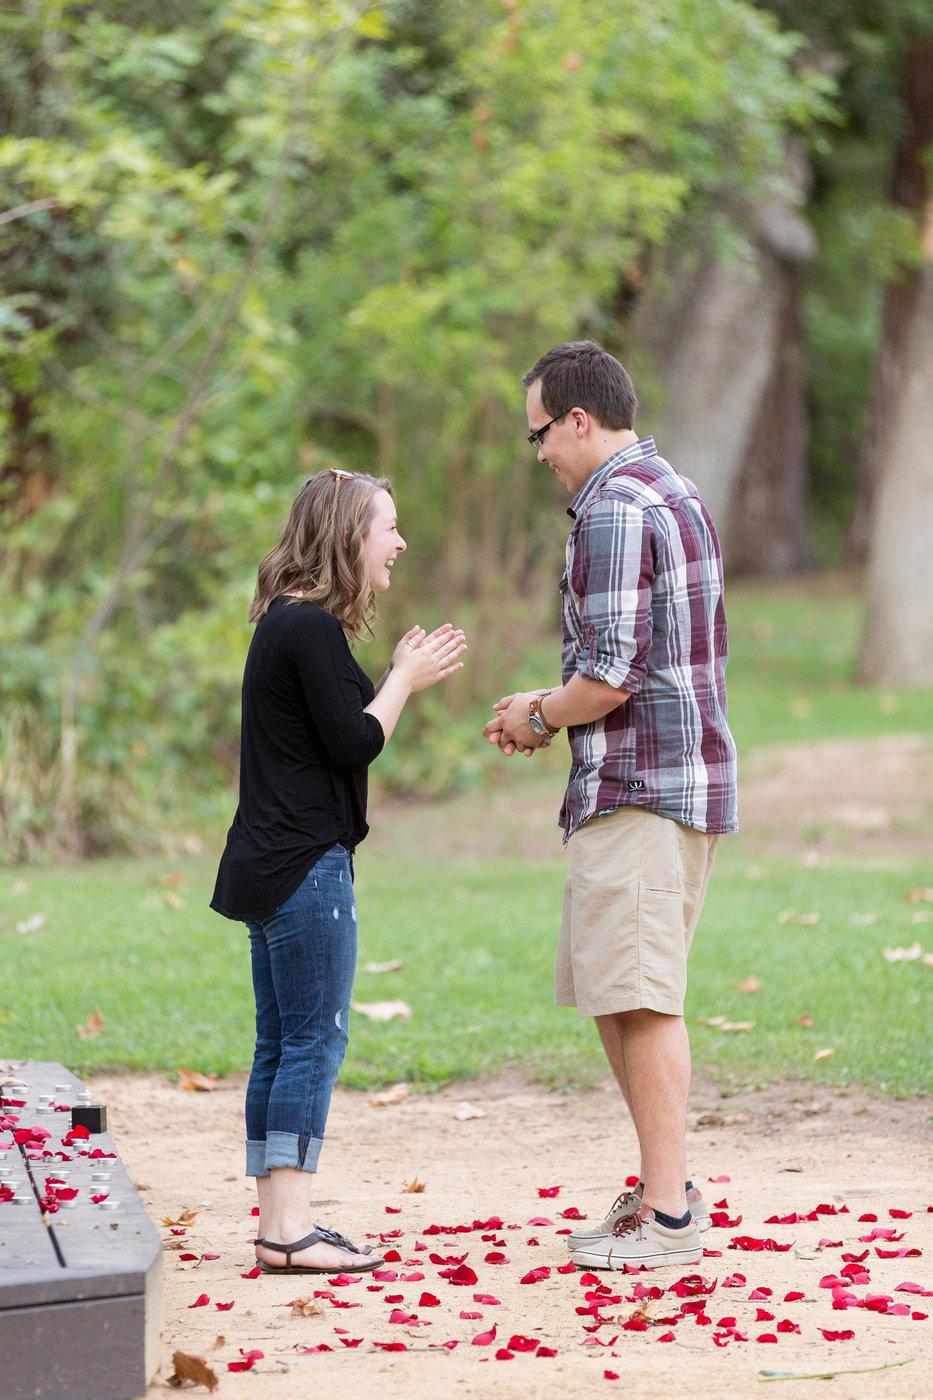 engagement-photographer-captures-proposal-at-neighborhood-churchjpg